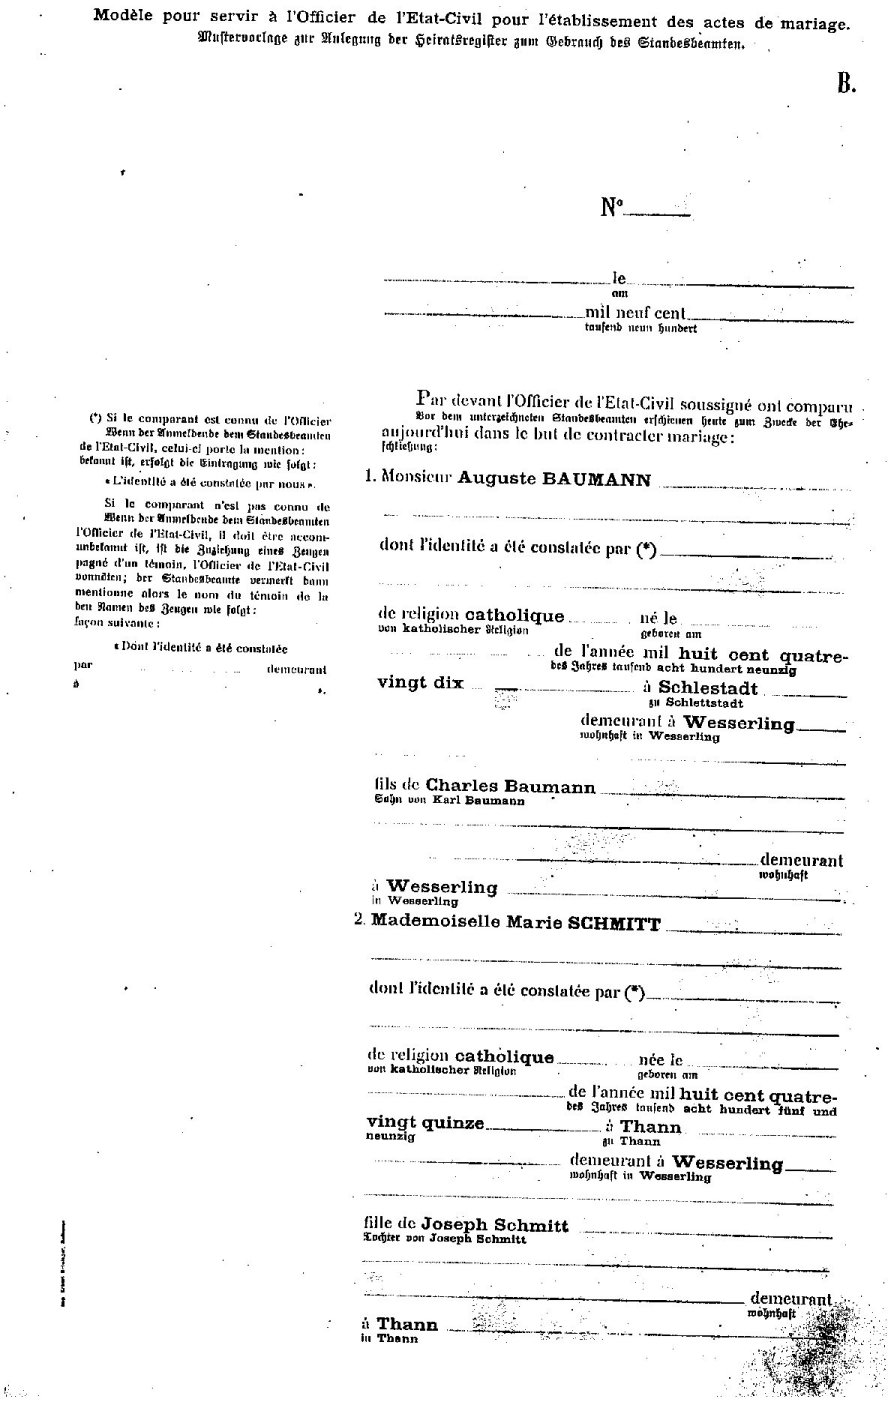 certificat de mariage - Acte De Mariage Nante